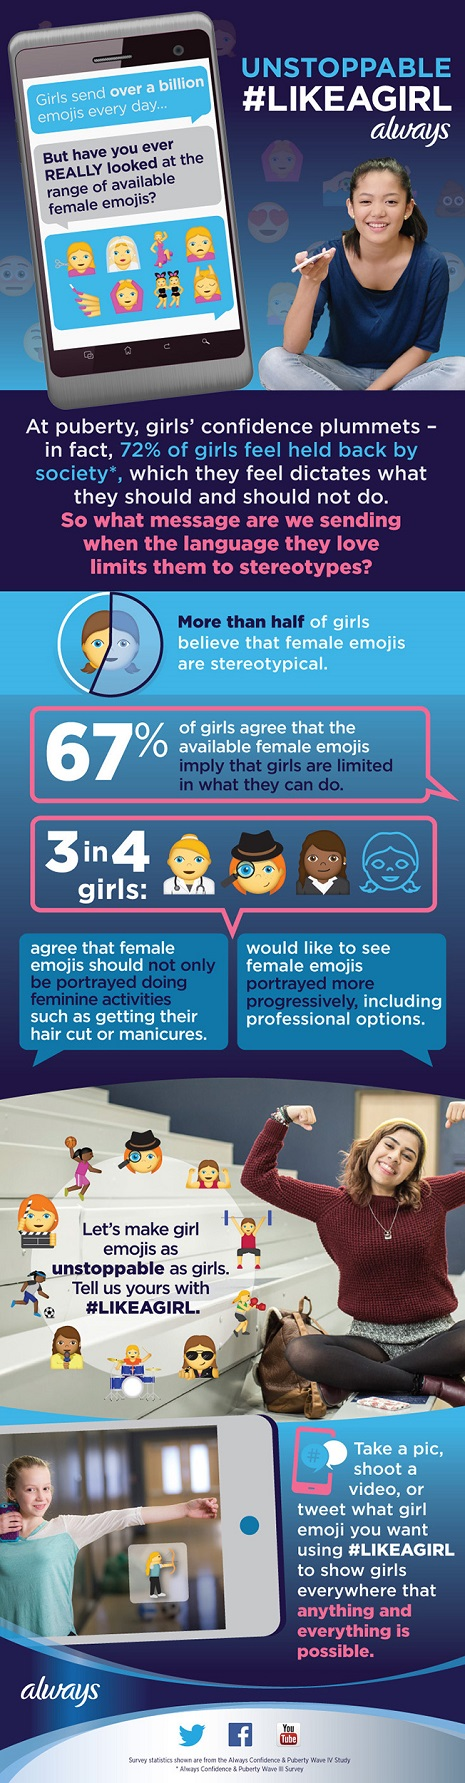 like-a-girl-emoji-infographic pq